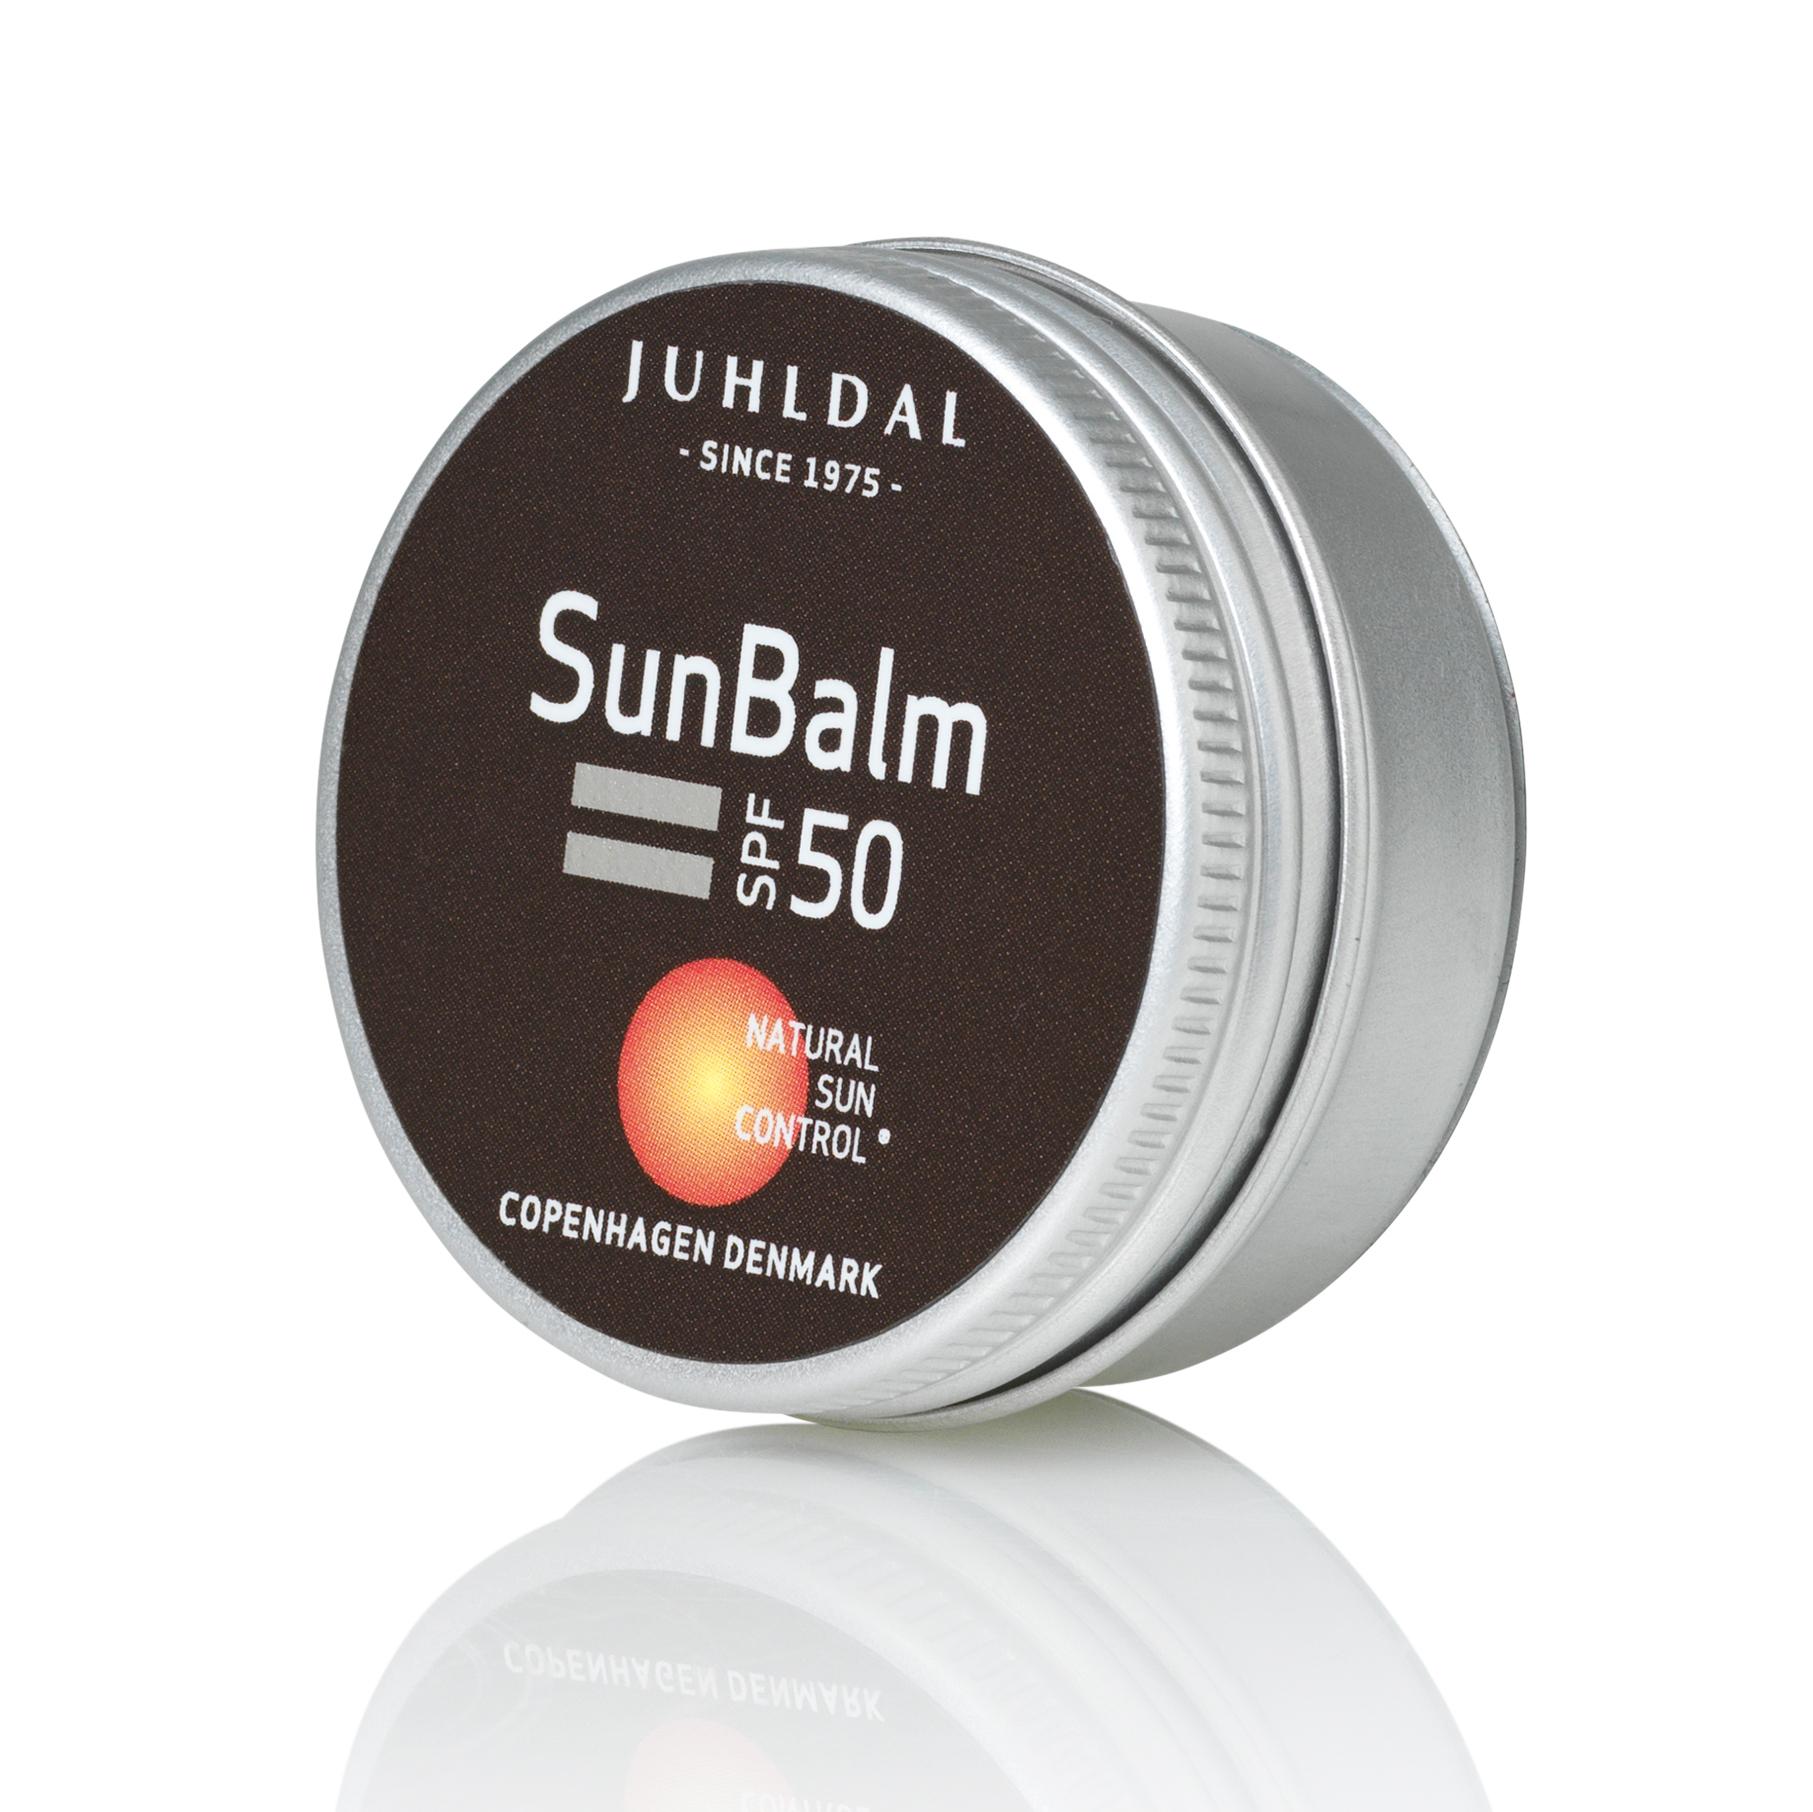 Juhldal SunBalm SPF50, 15 ml